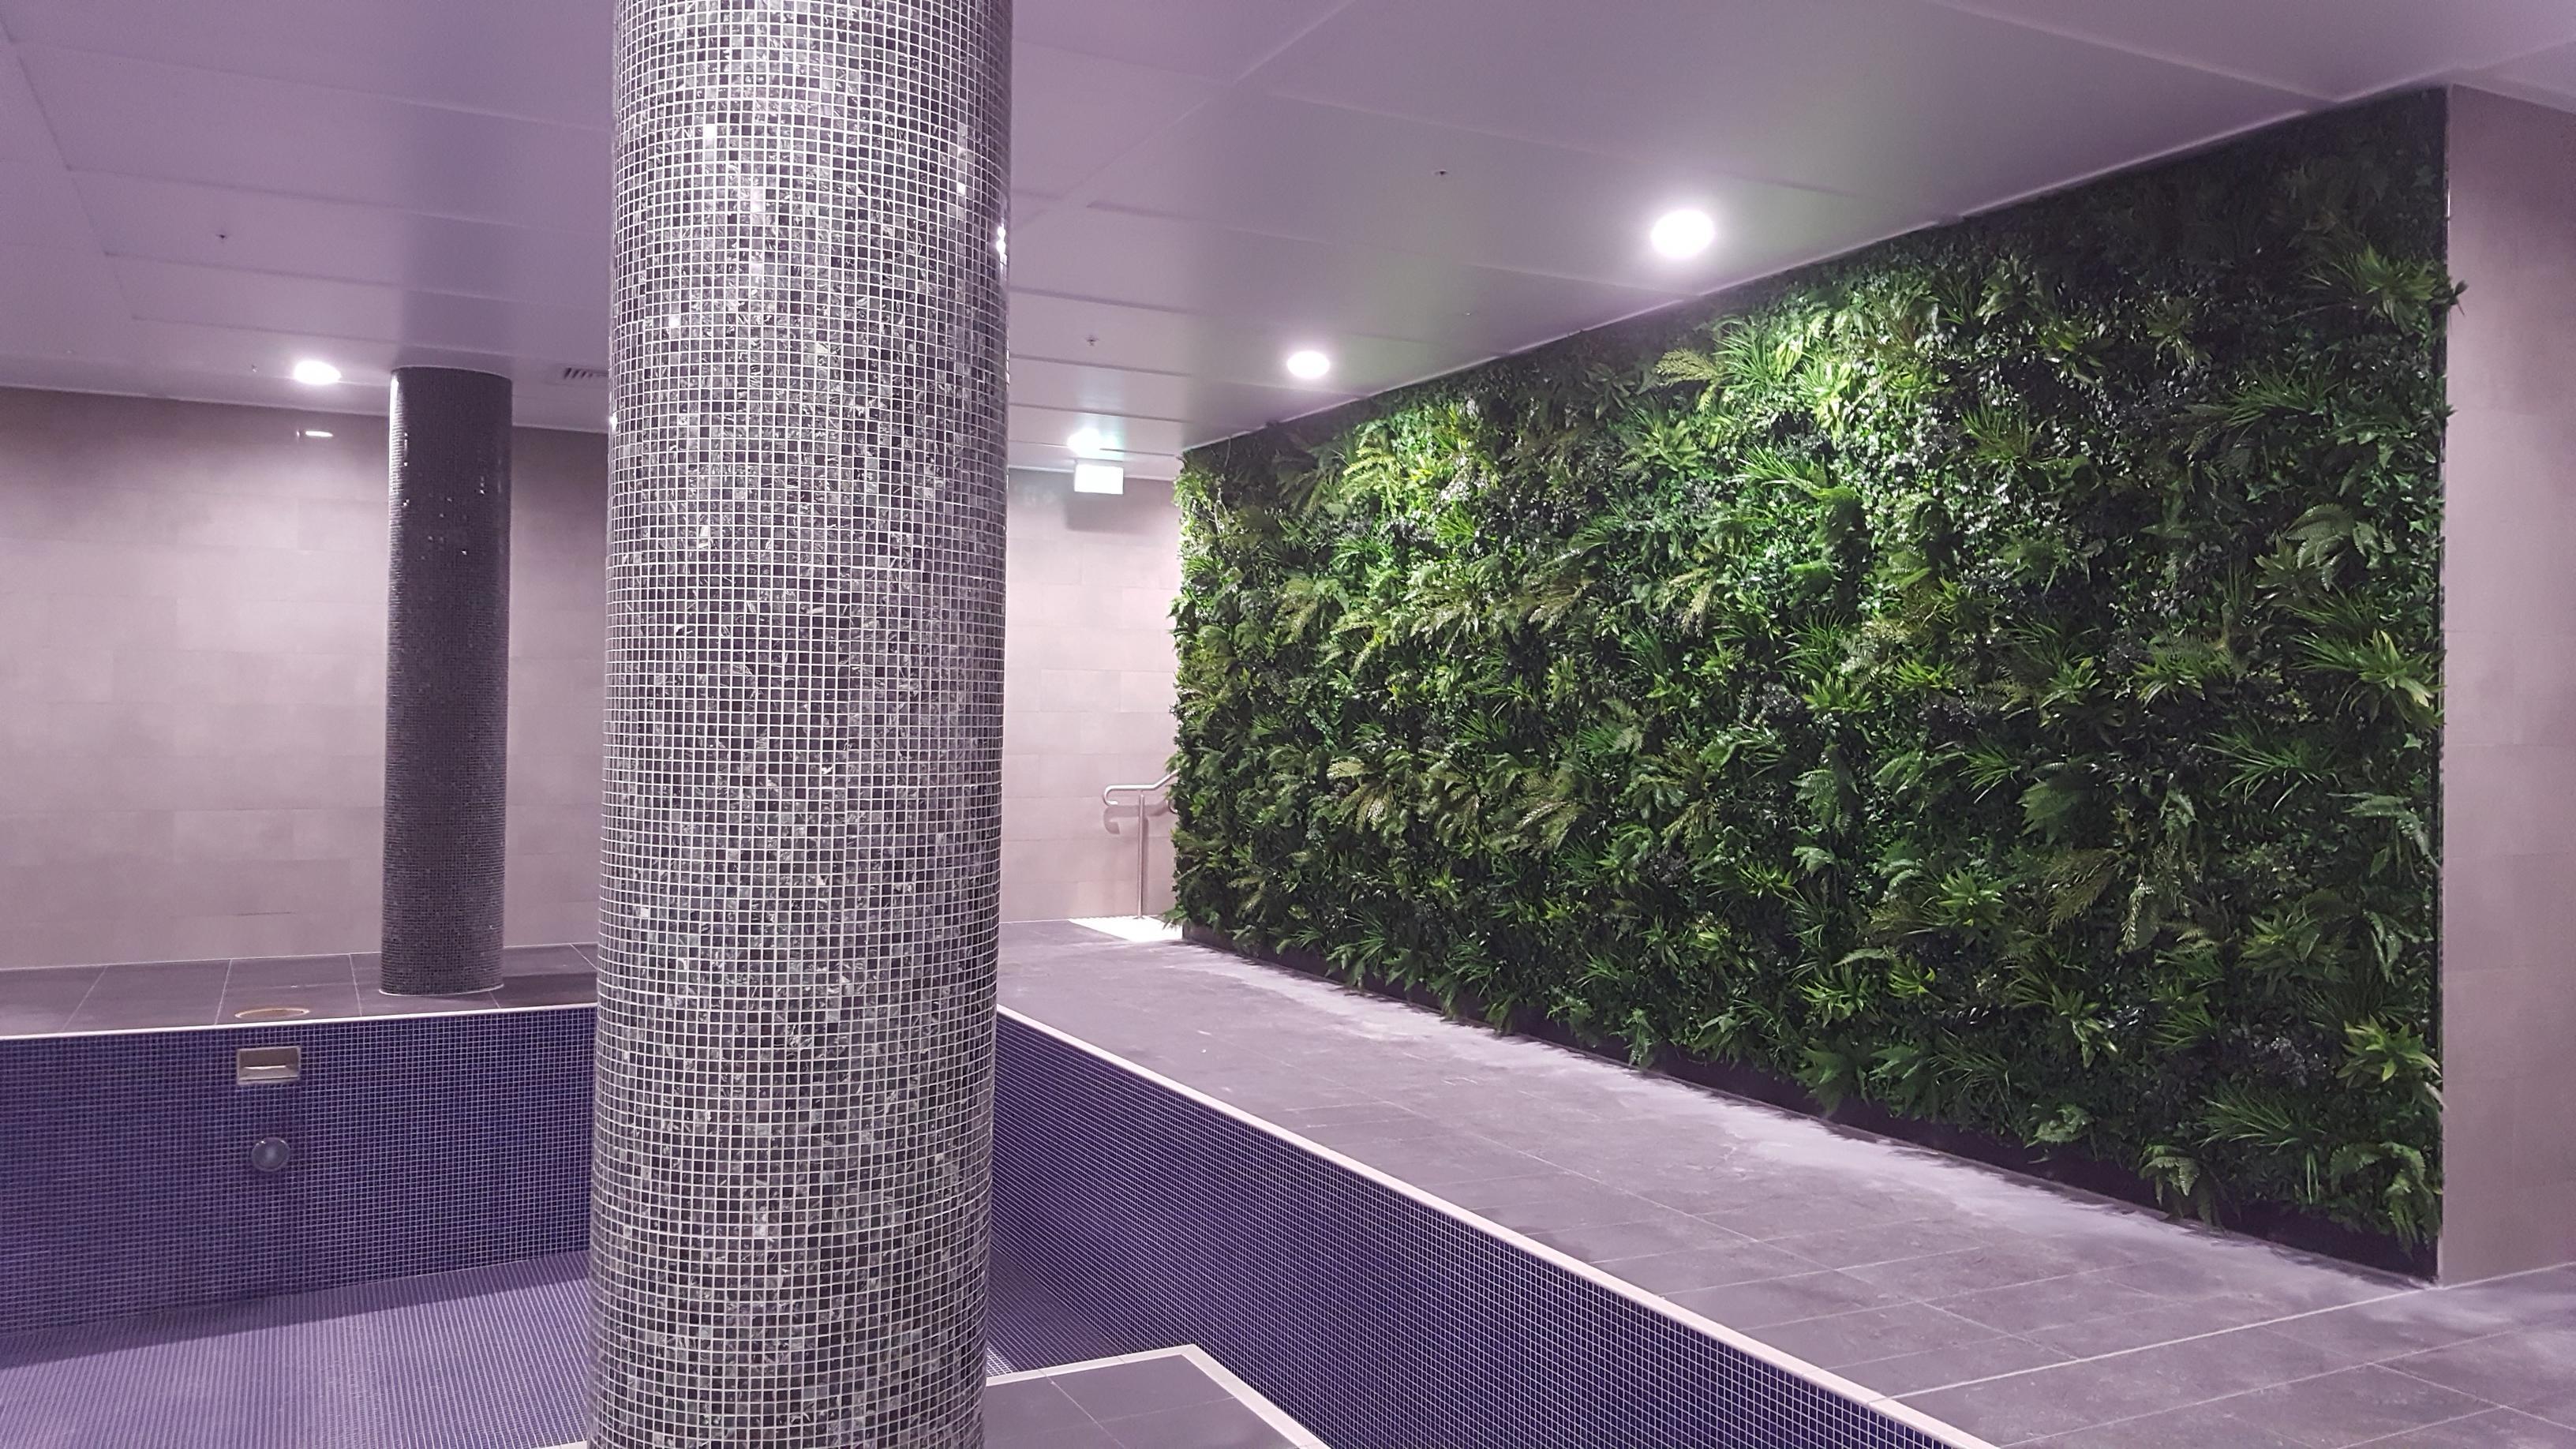 Indoor Swimming Pool Green Wall